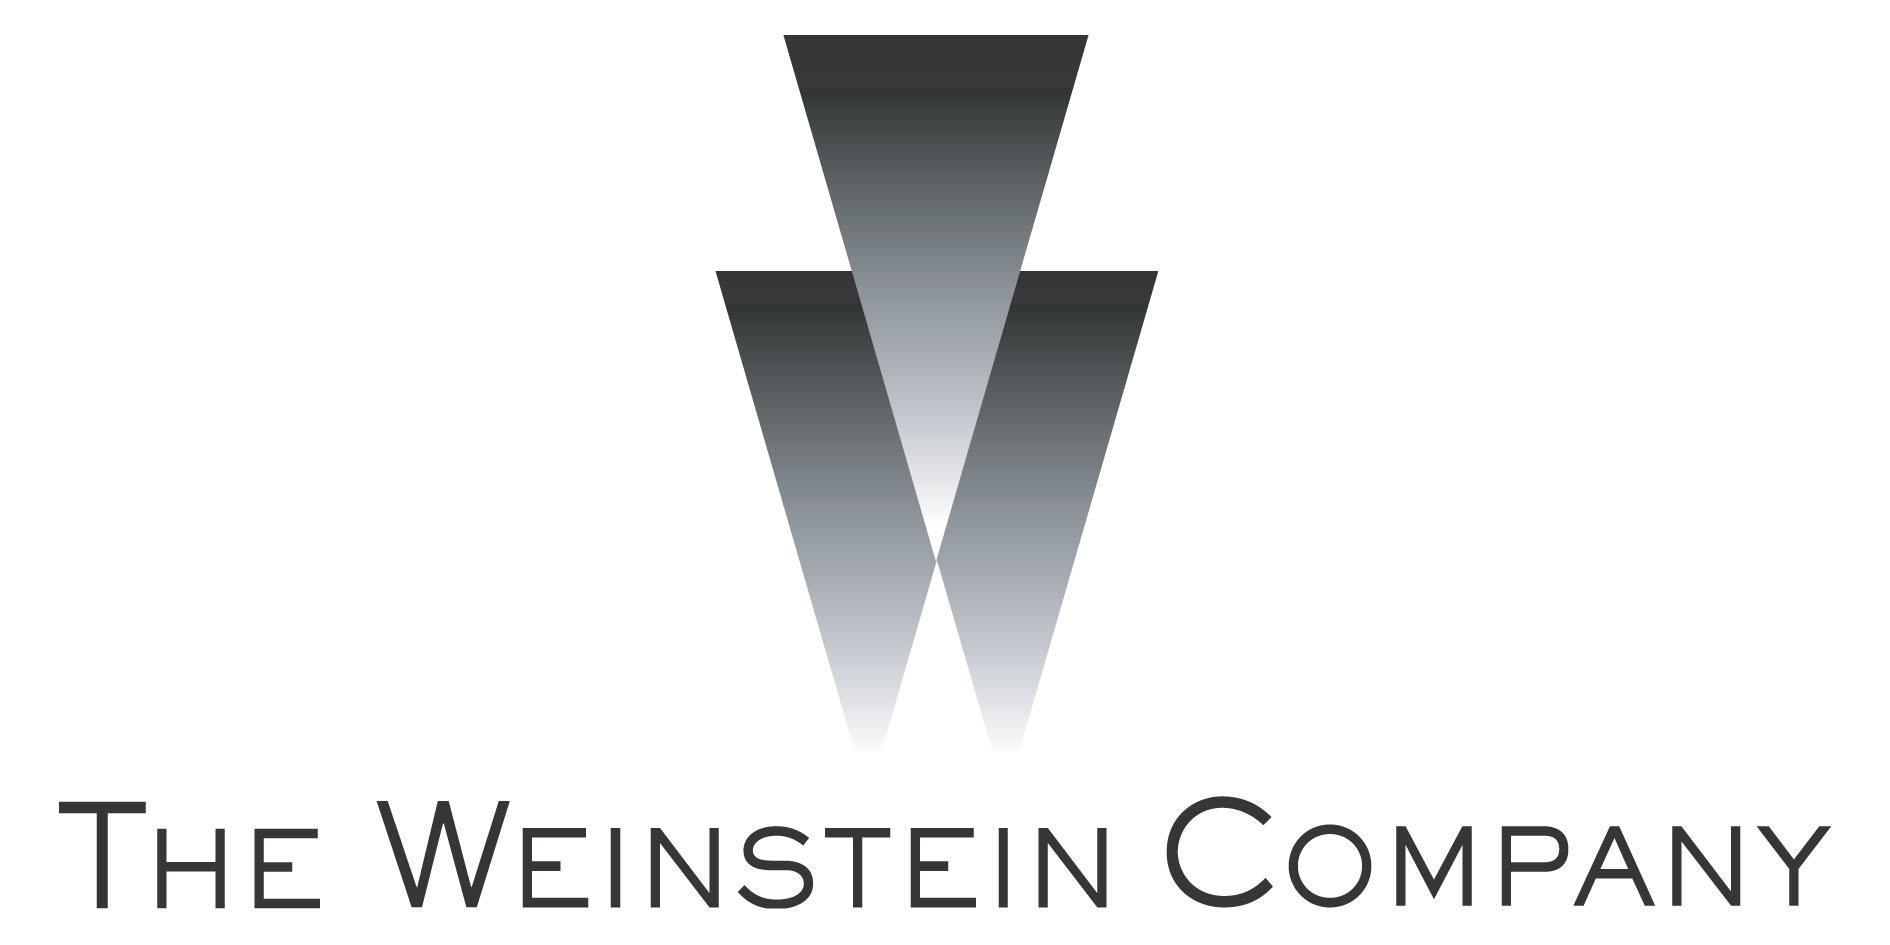 The Weinstein Company company logo